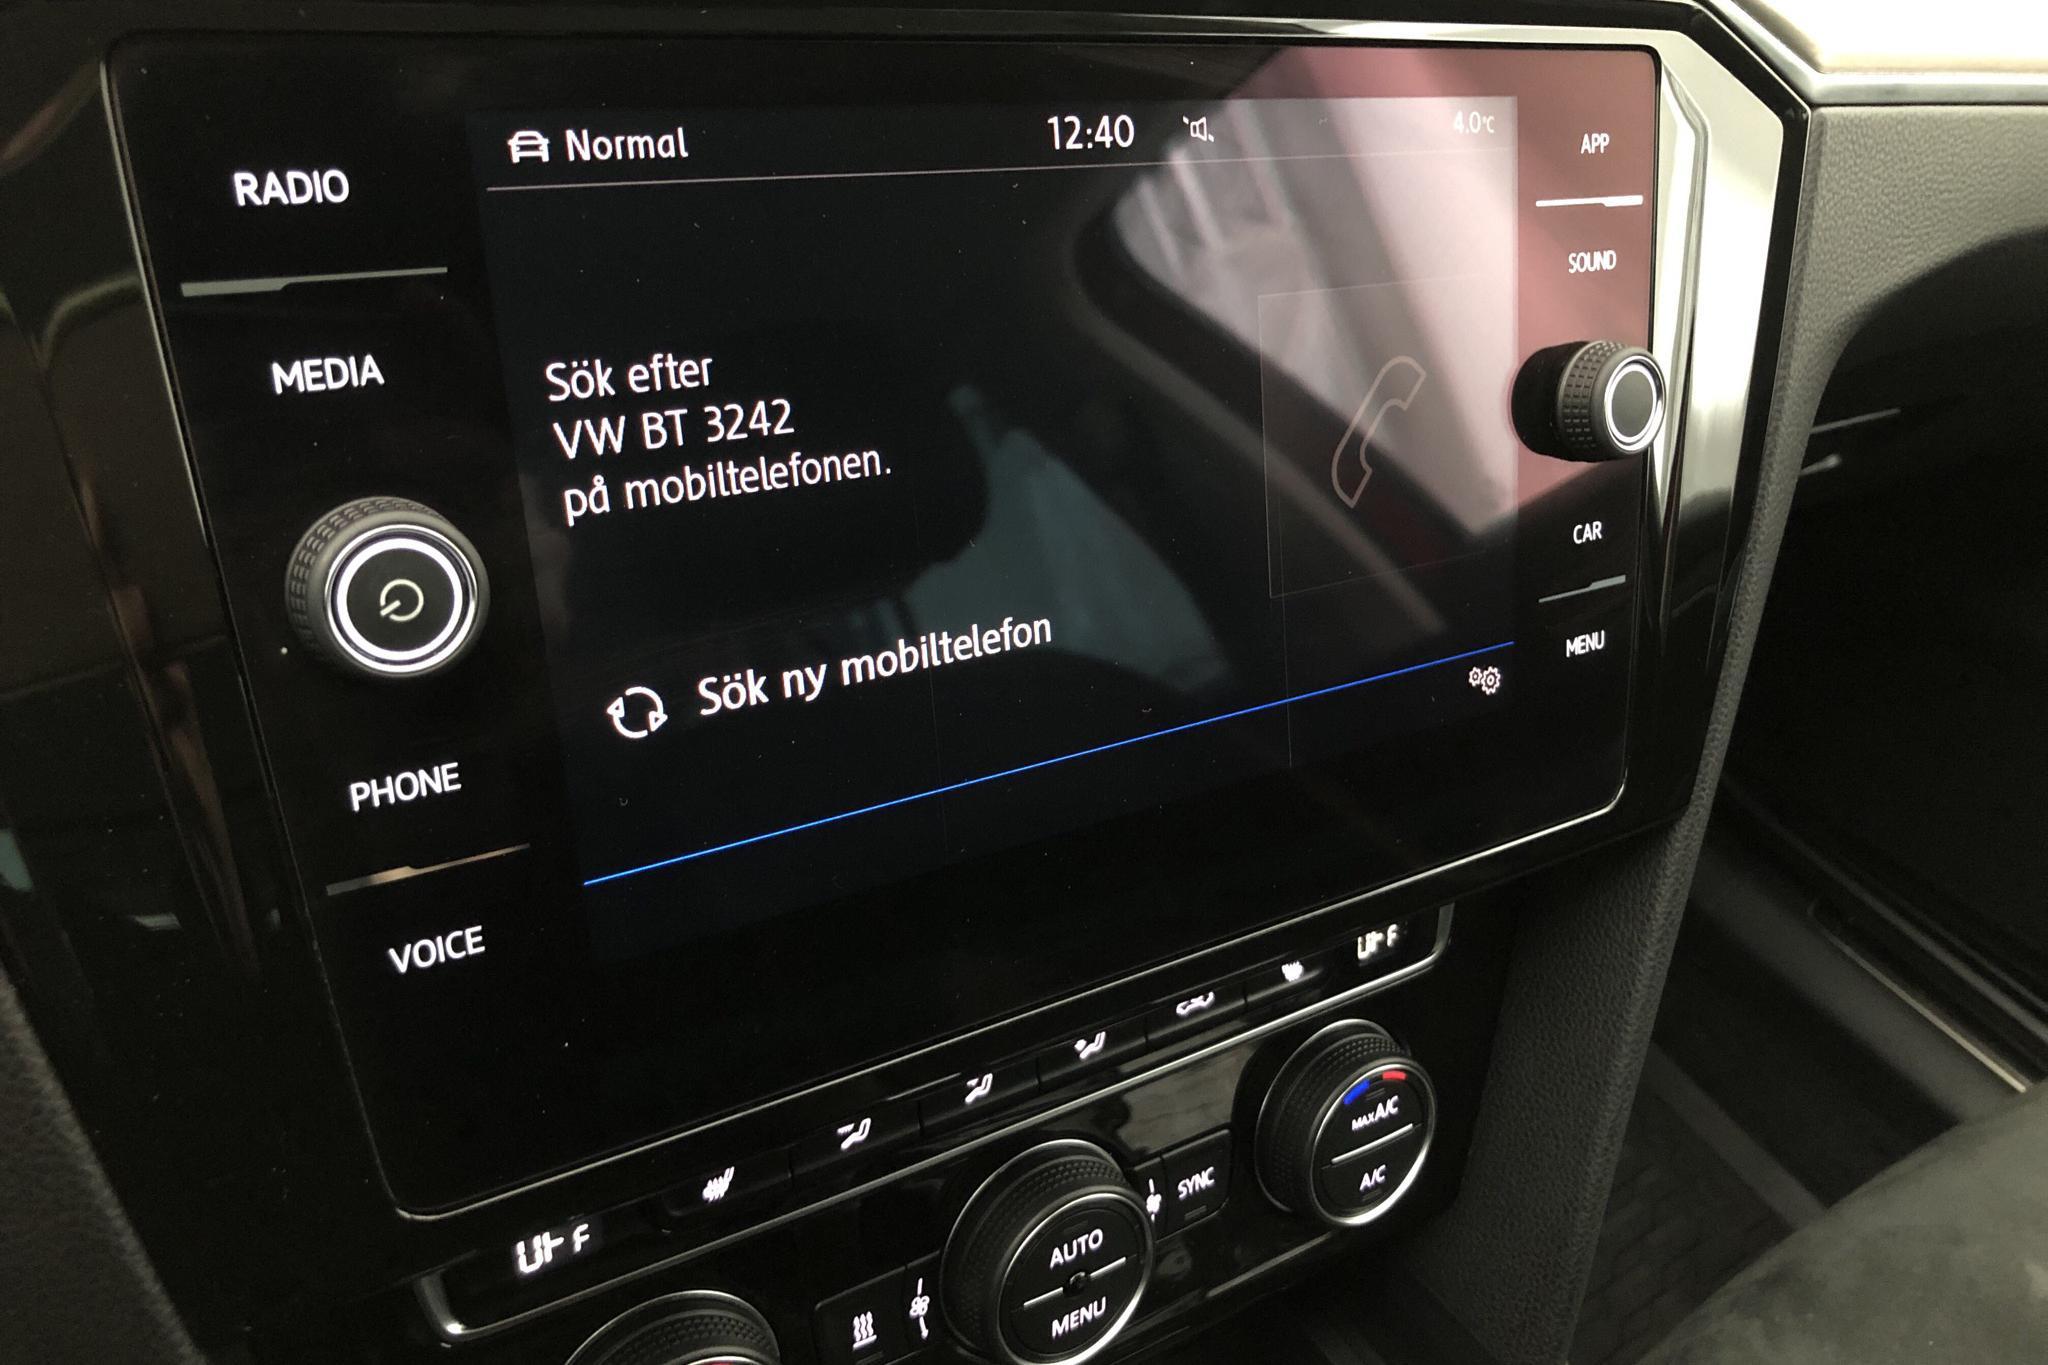 VW Passat 2.0 TDI Sportscombi (190hk) - 124 350 km - Automatic - red - 2018